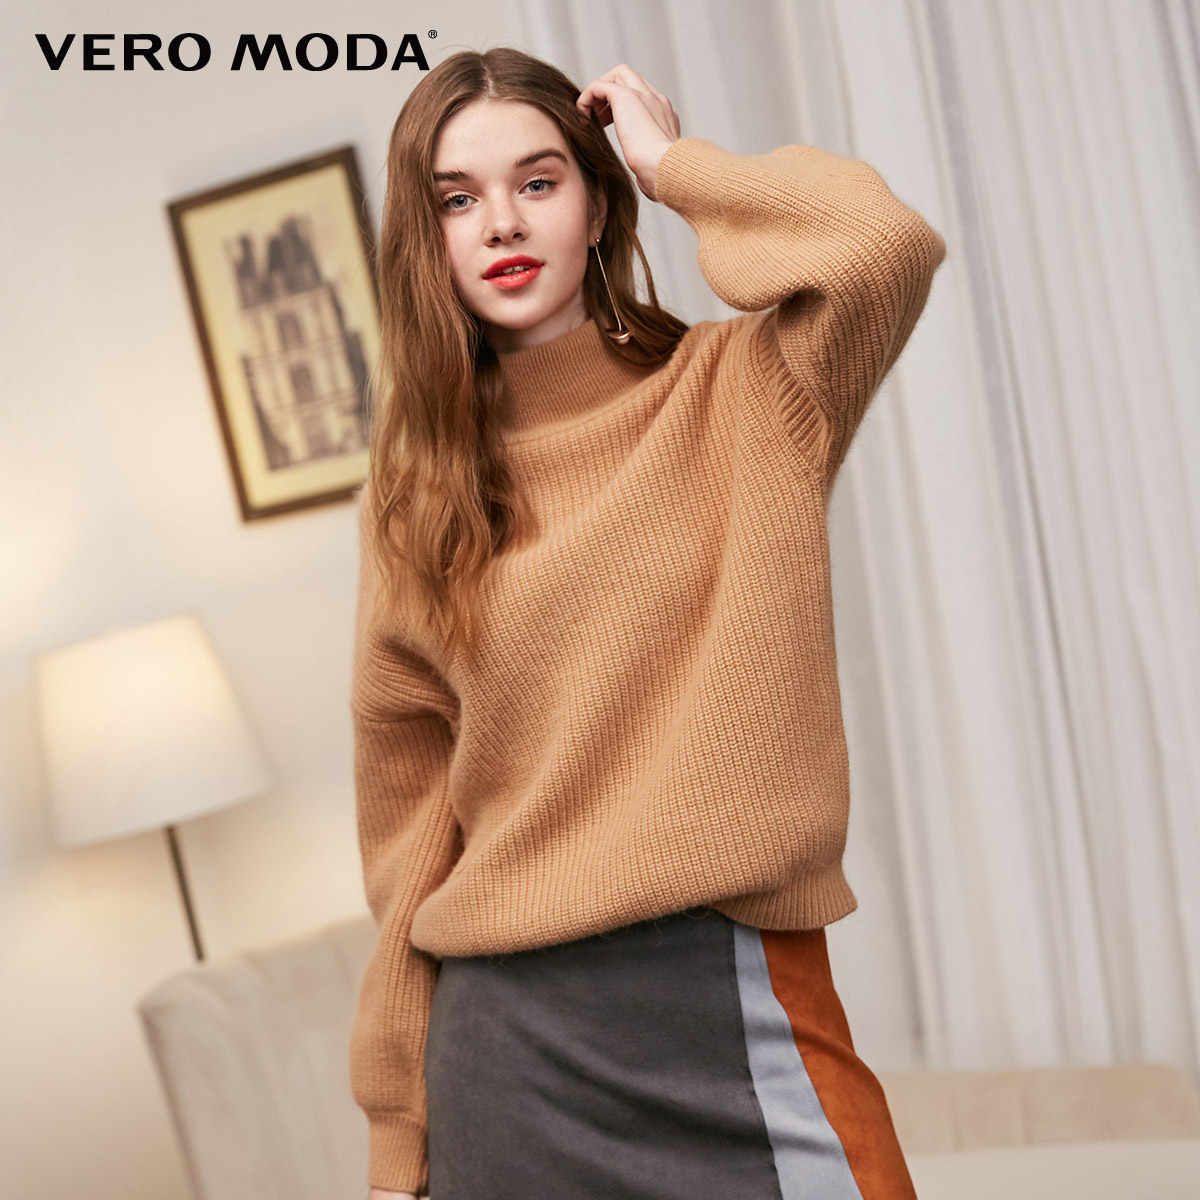 Vero Moda Nữ Ins Lưng Rỗng Ra Cổ Cao Lỏng Lẻo Áo Len | 318413588